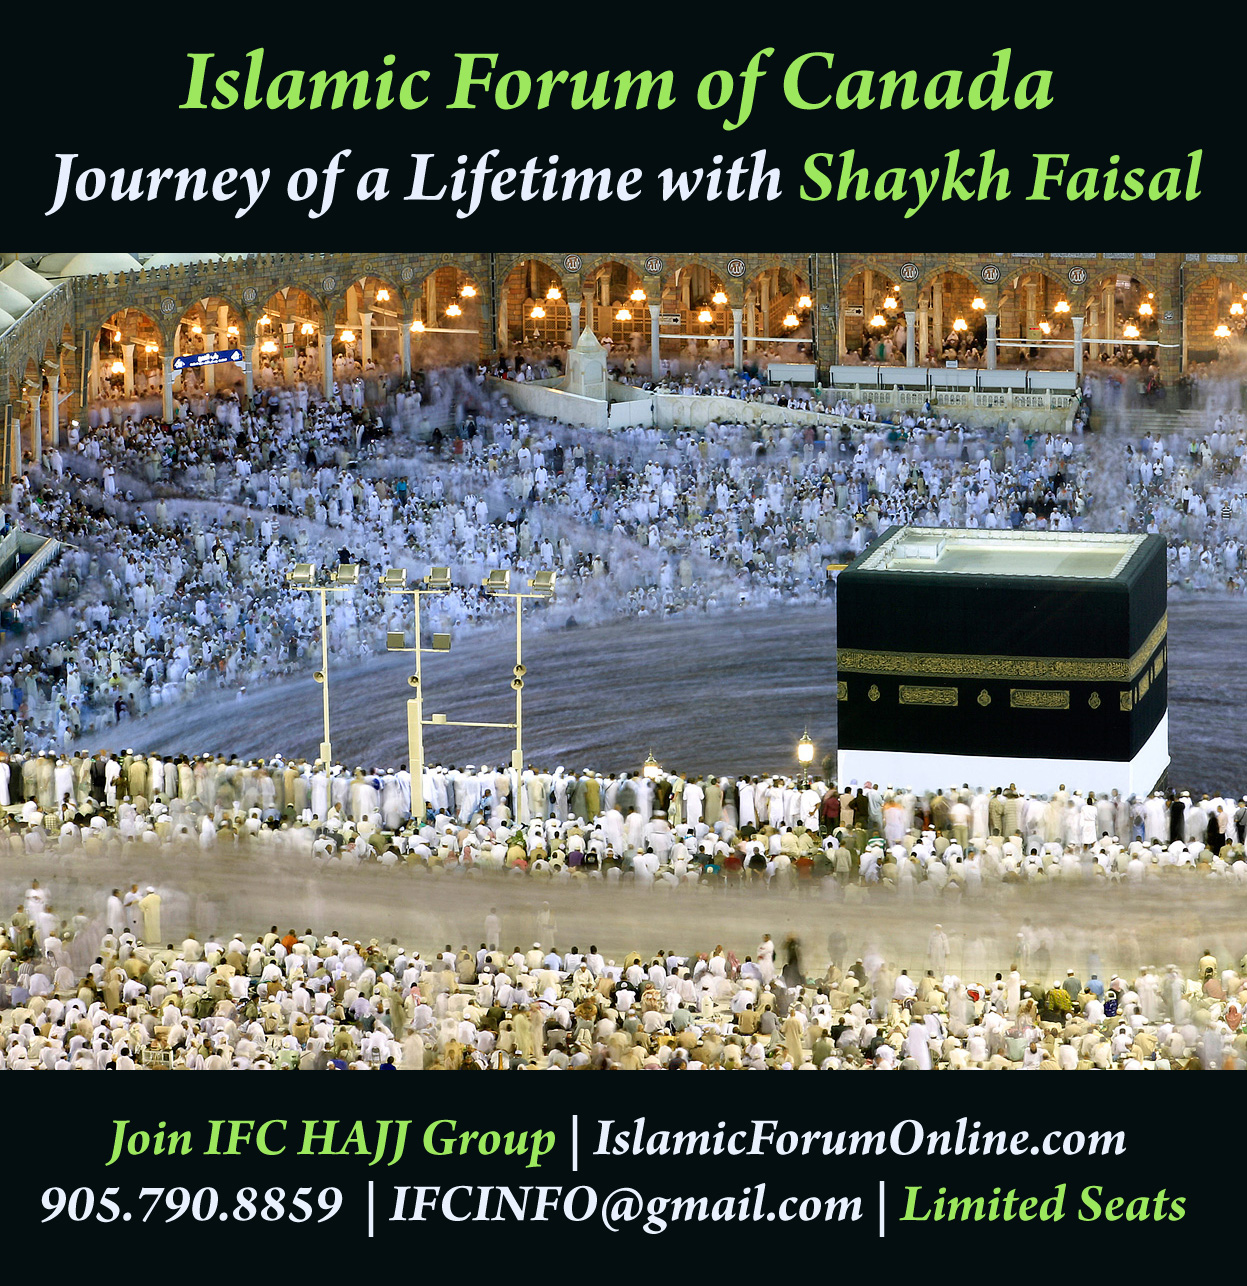 IFC-Hajj-Group--Journey-of-a-Lifetime-with-Shaykh-Faisal-